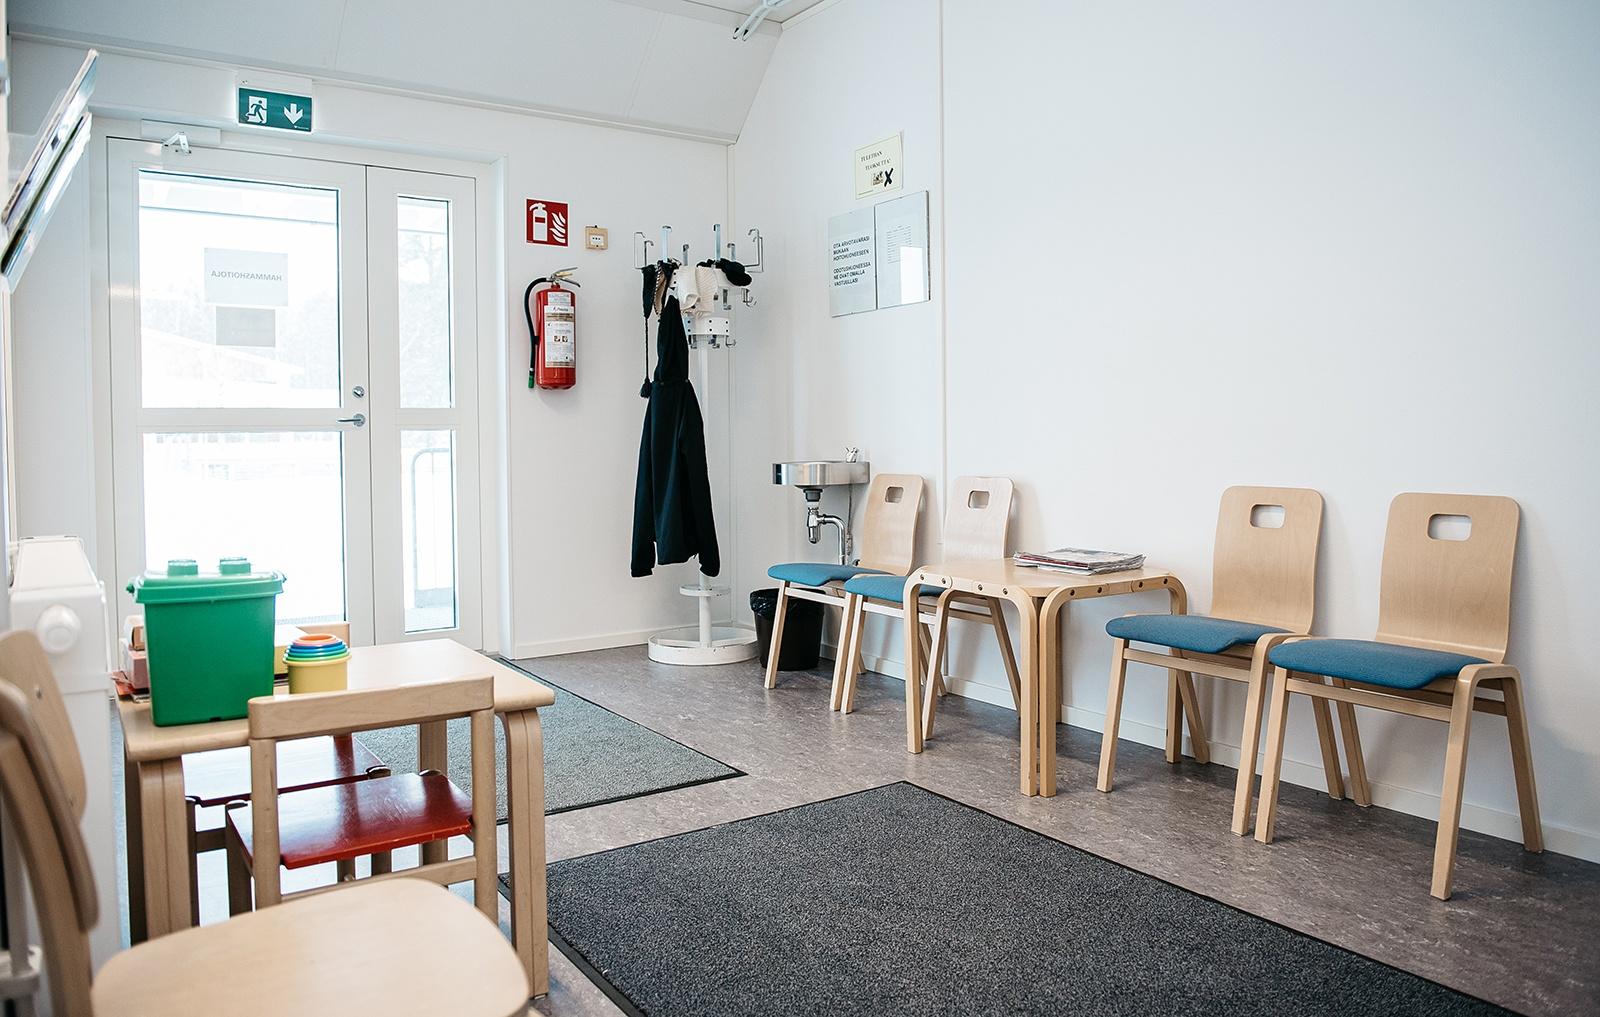 Healthcare-Joensuu-Finland_1600